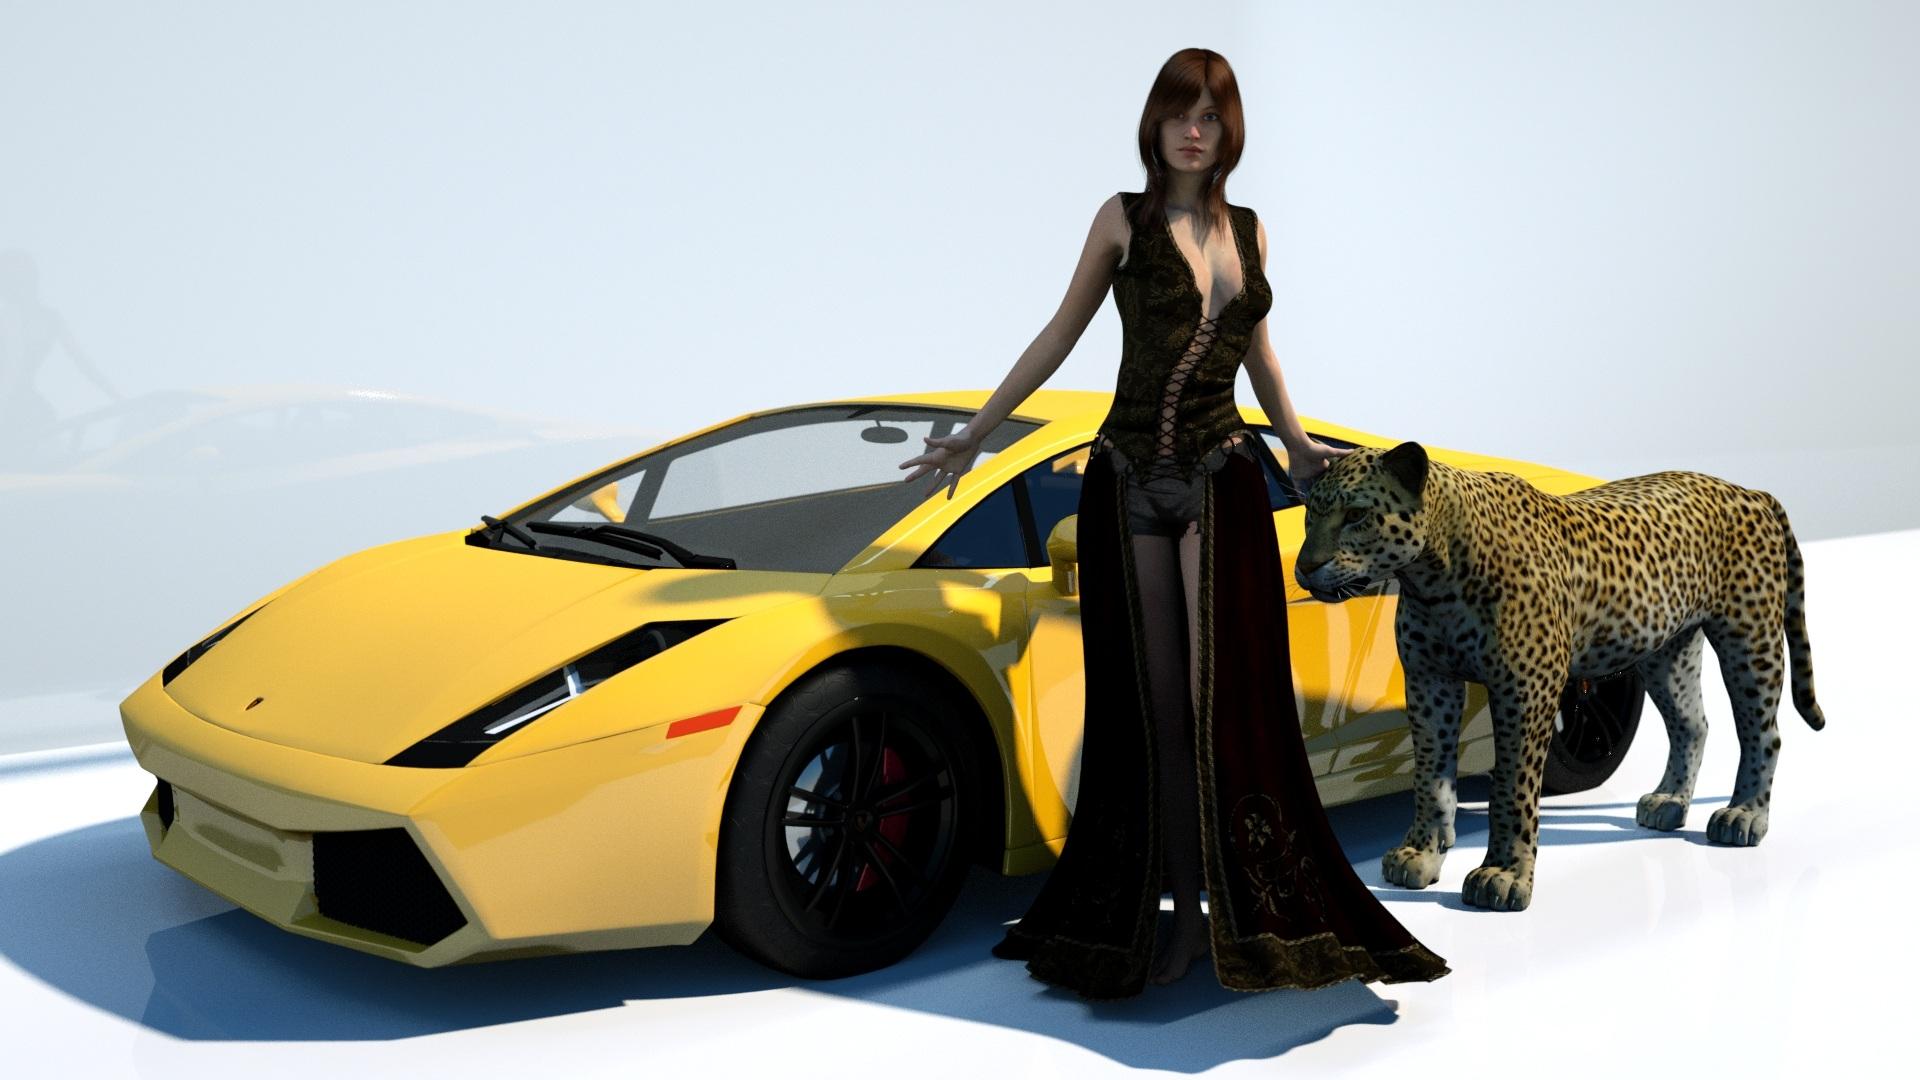 Woman Car Model Vehicle Yellow Leopard Sports Car Cheetah Colour Supercar Y Lamborghini Model Car Land Public Domain